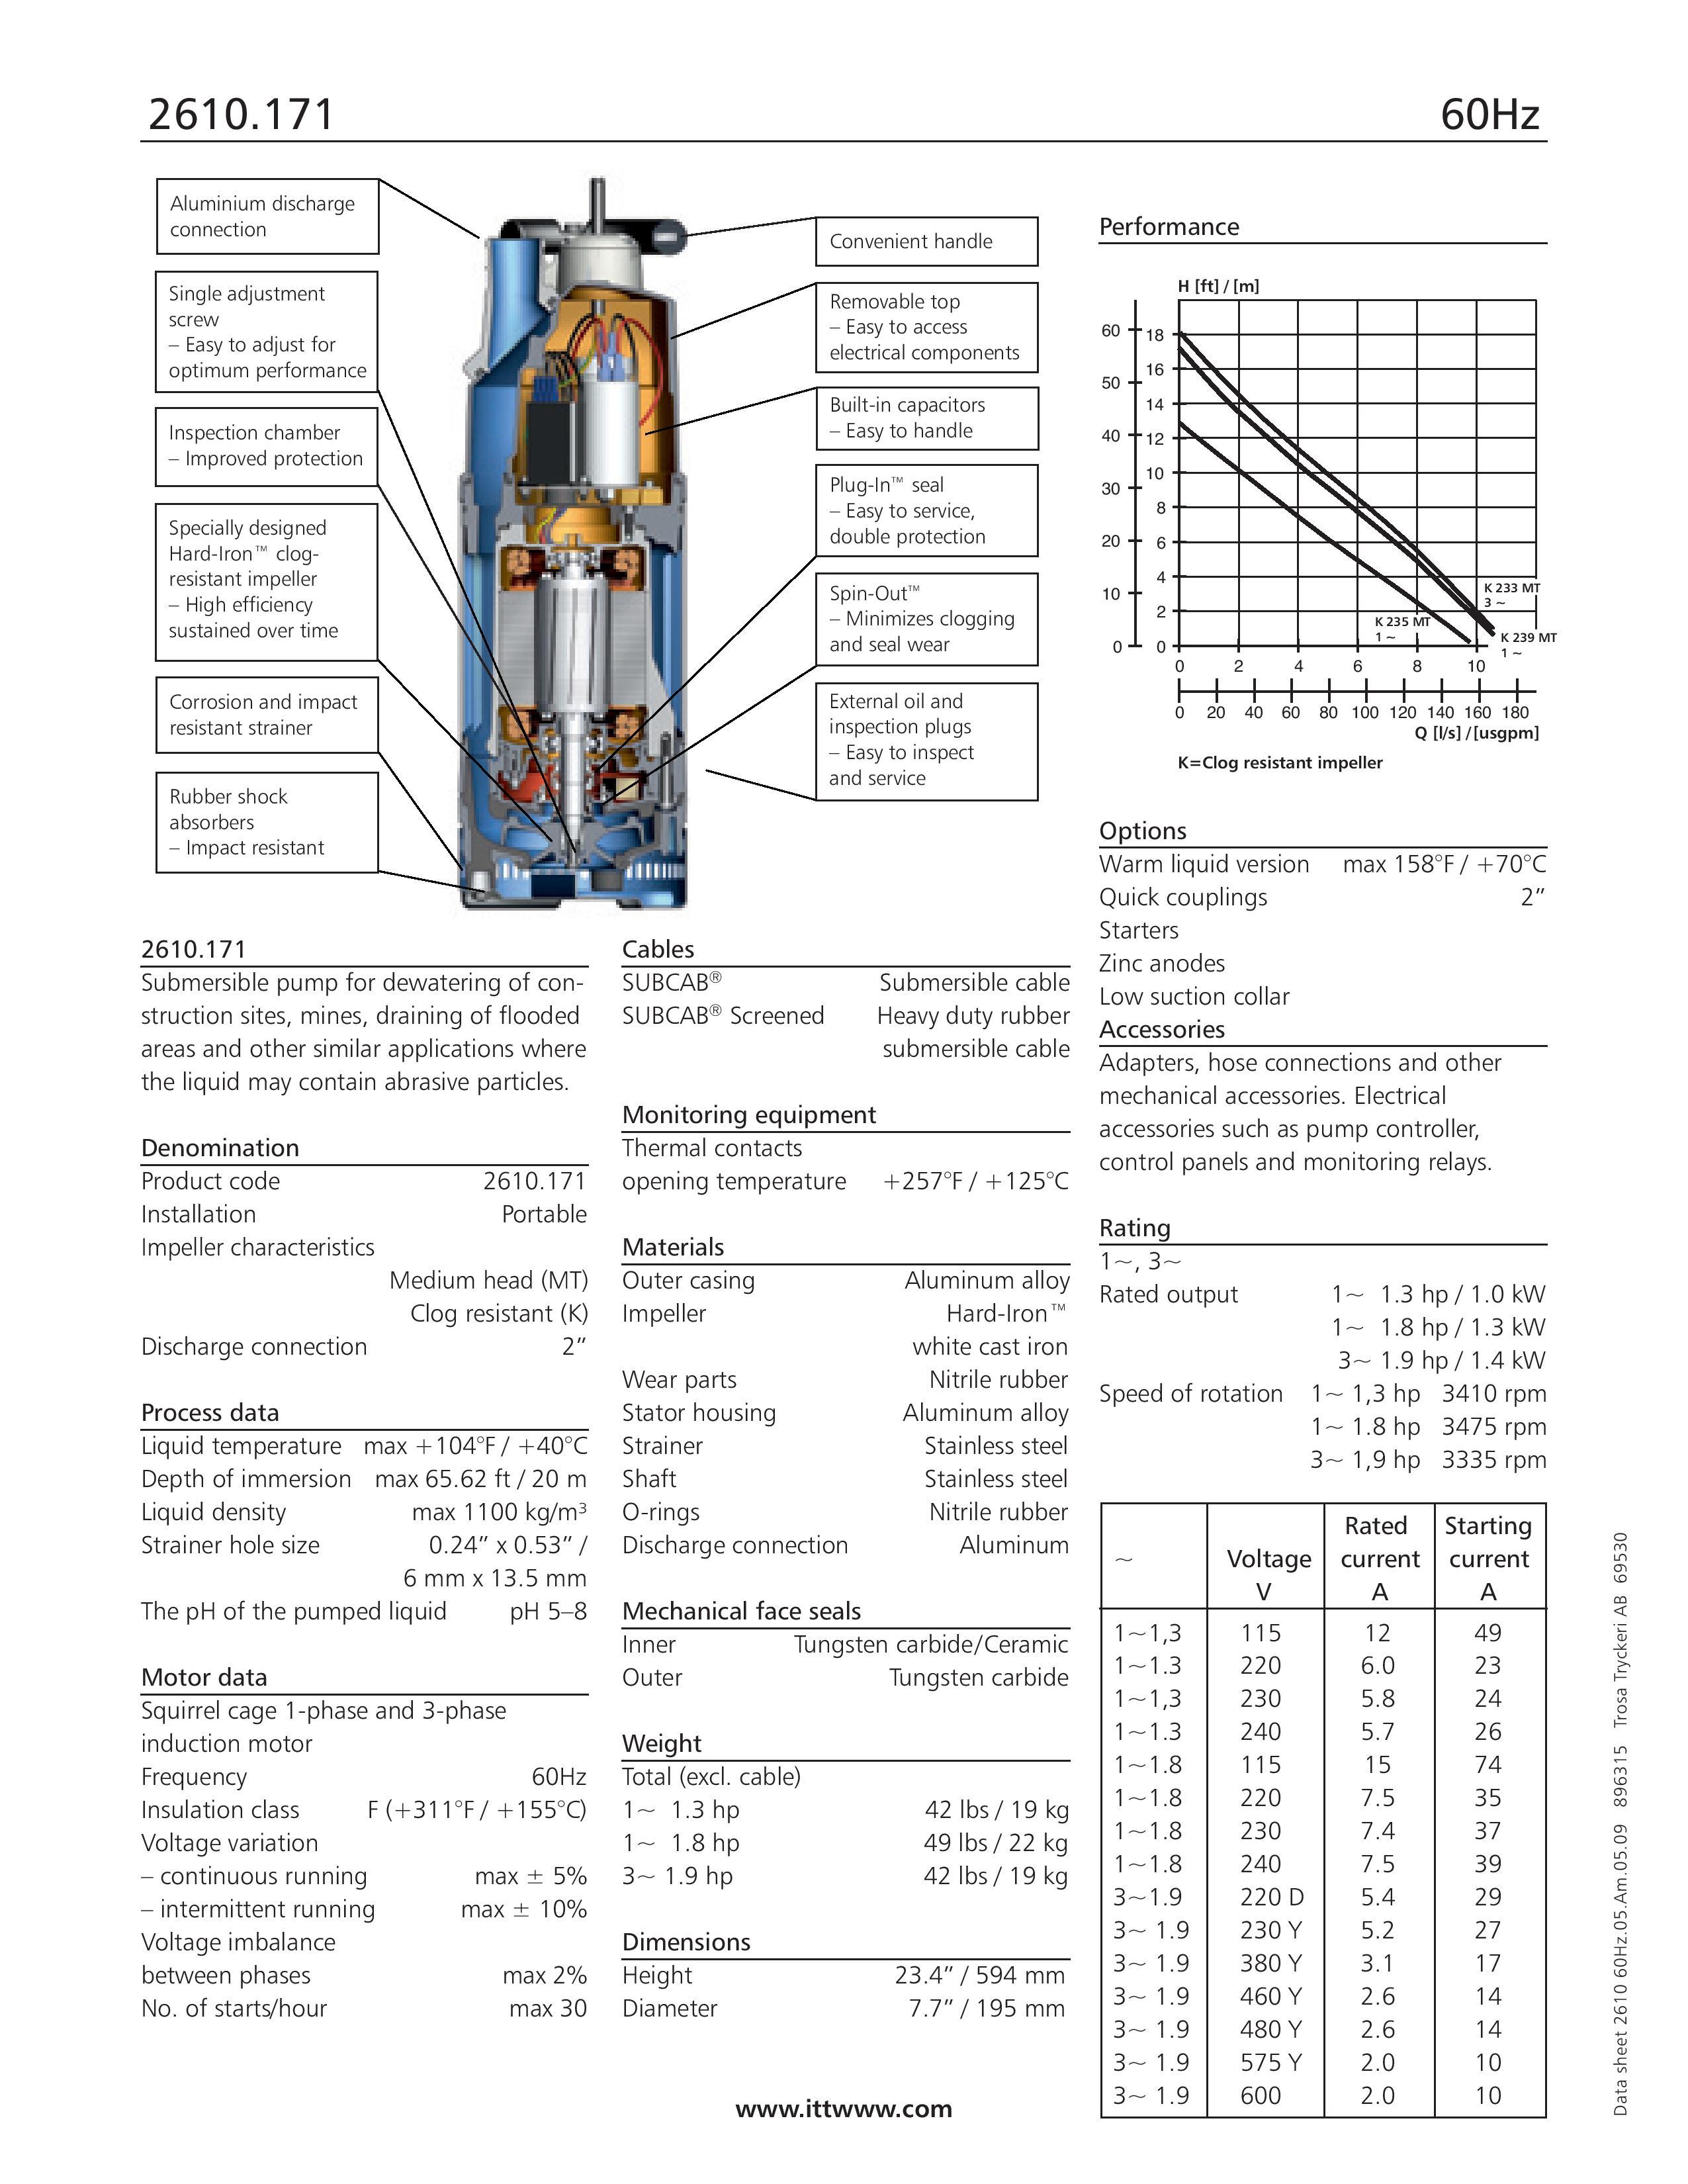 Flygt Submersible Pump Supplier Worldwide